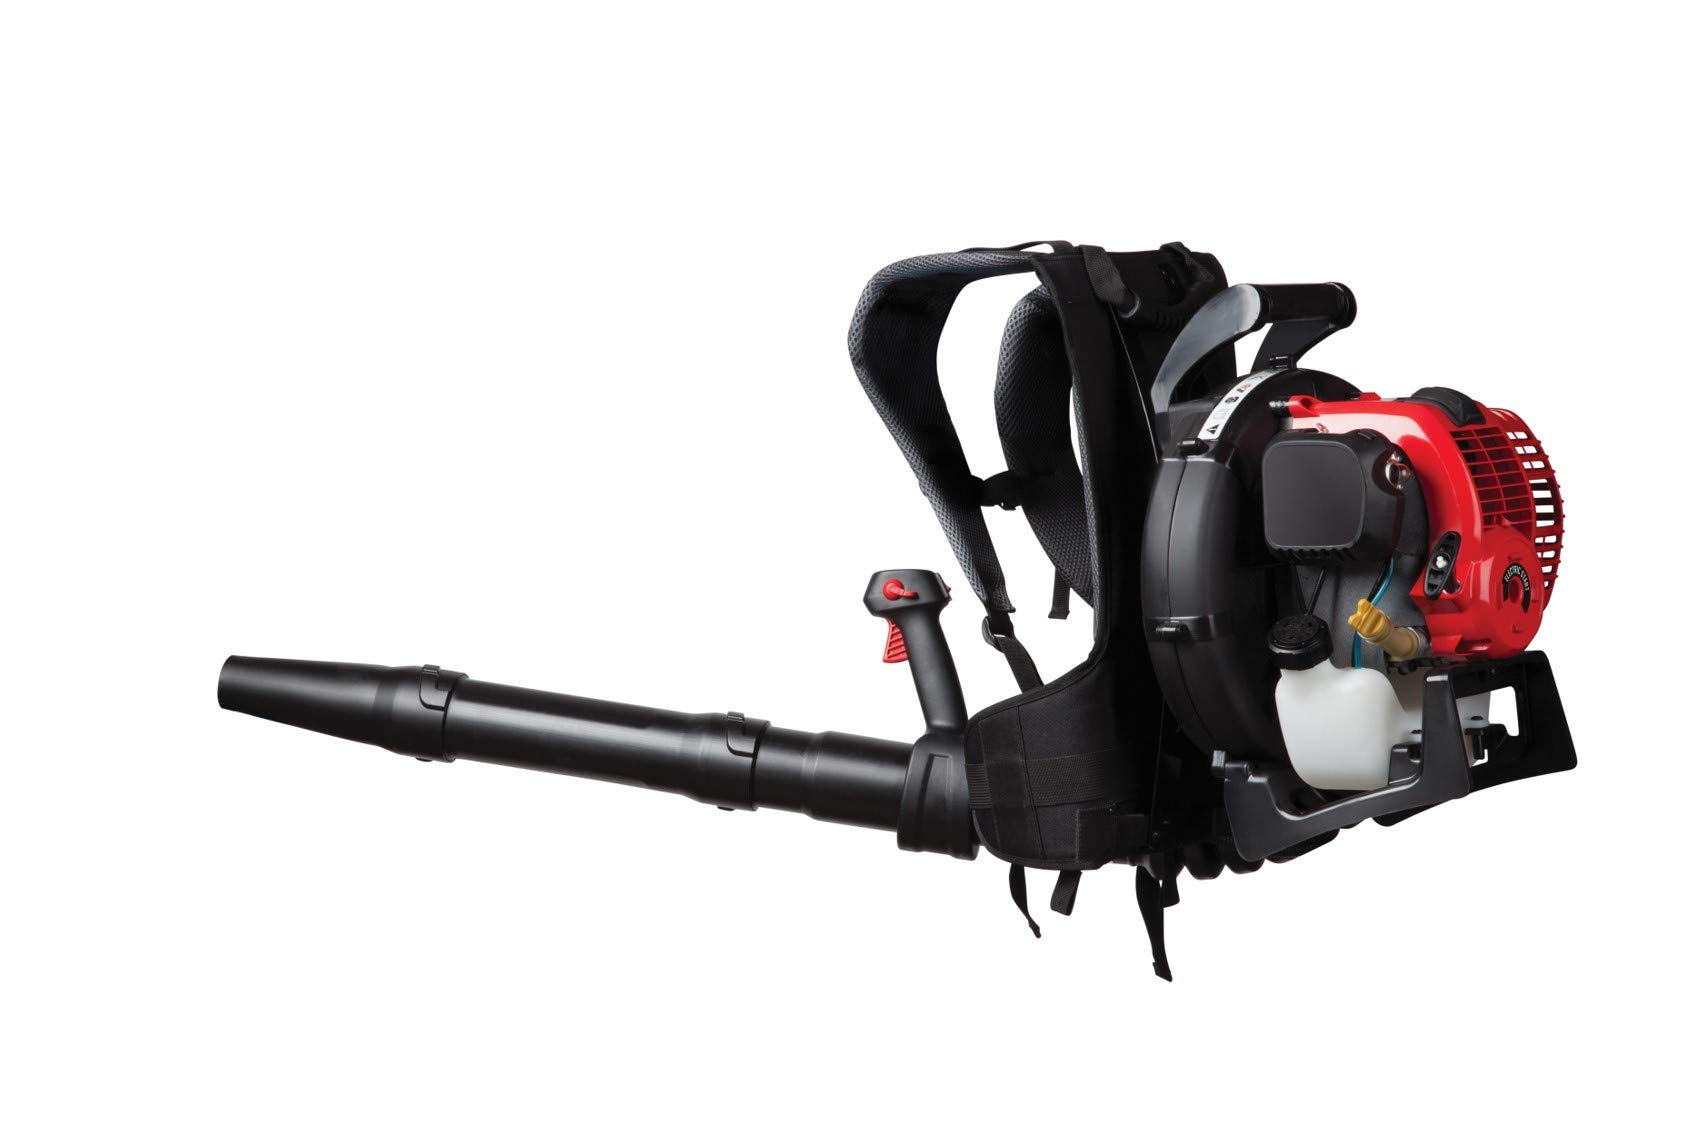 CRAFTSMAN BP410 4 Cycle Full Crank Backpack